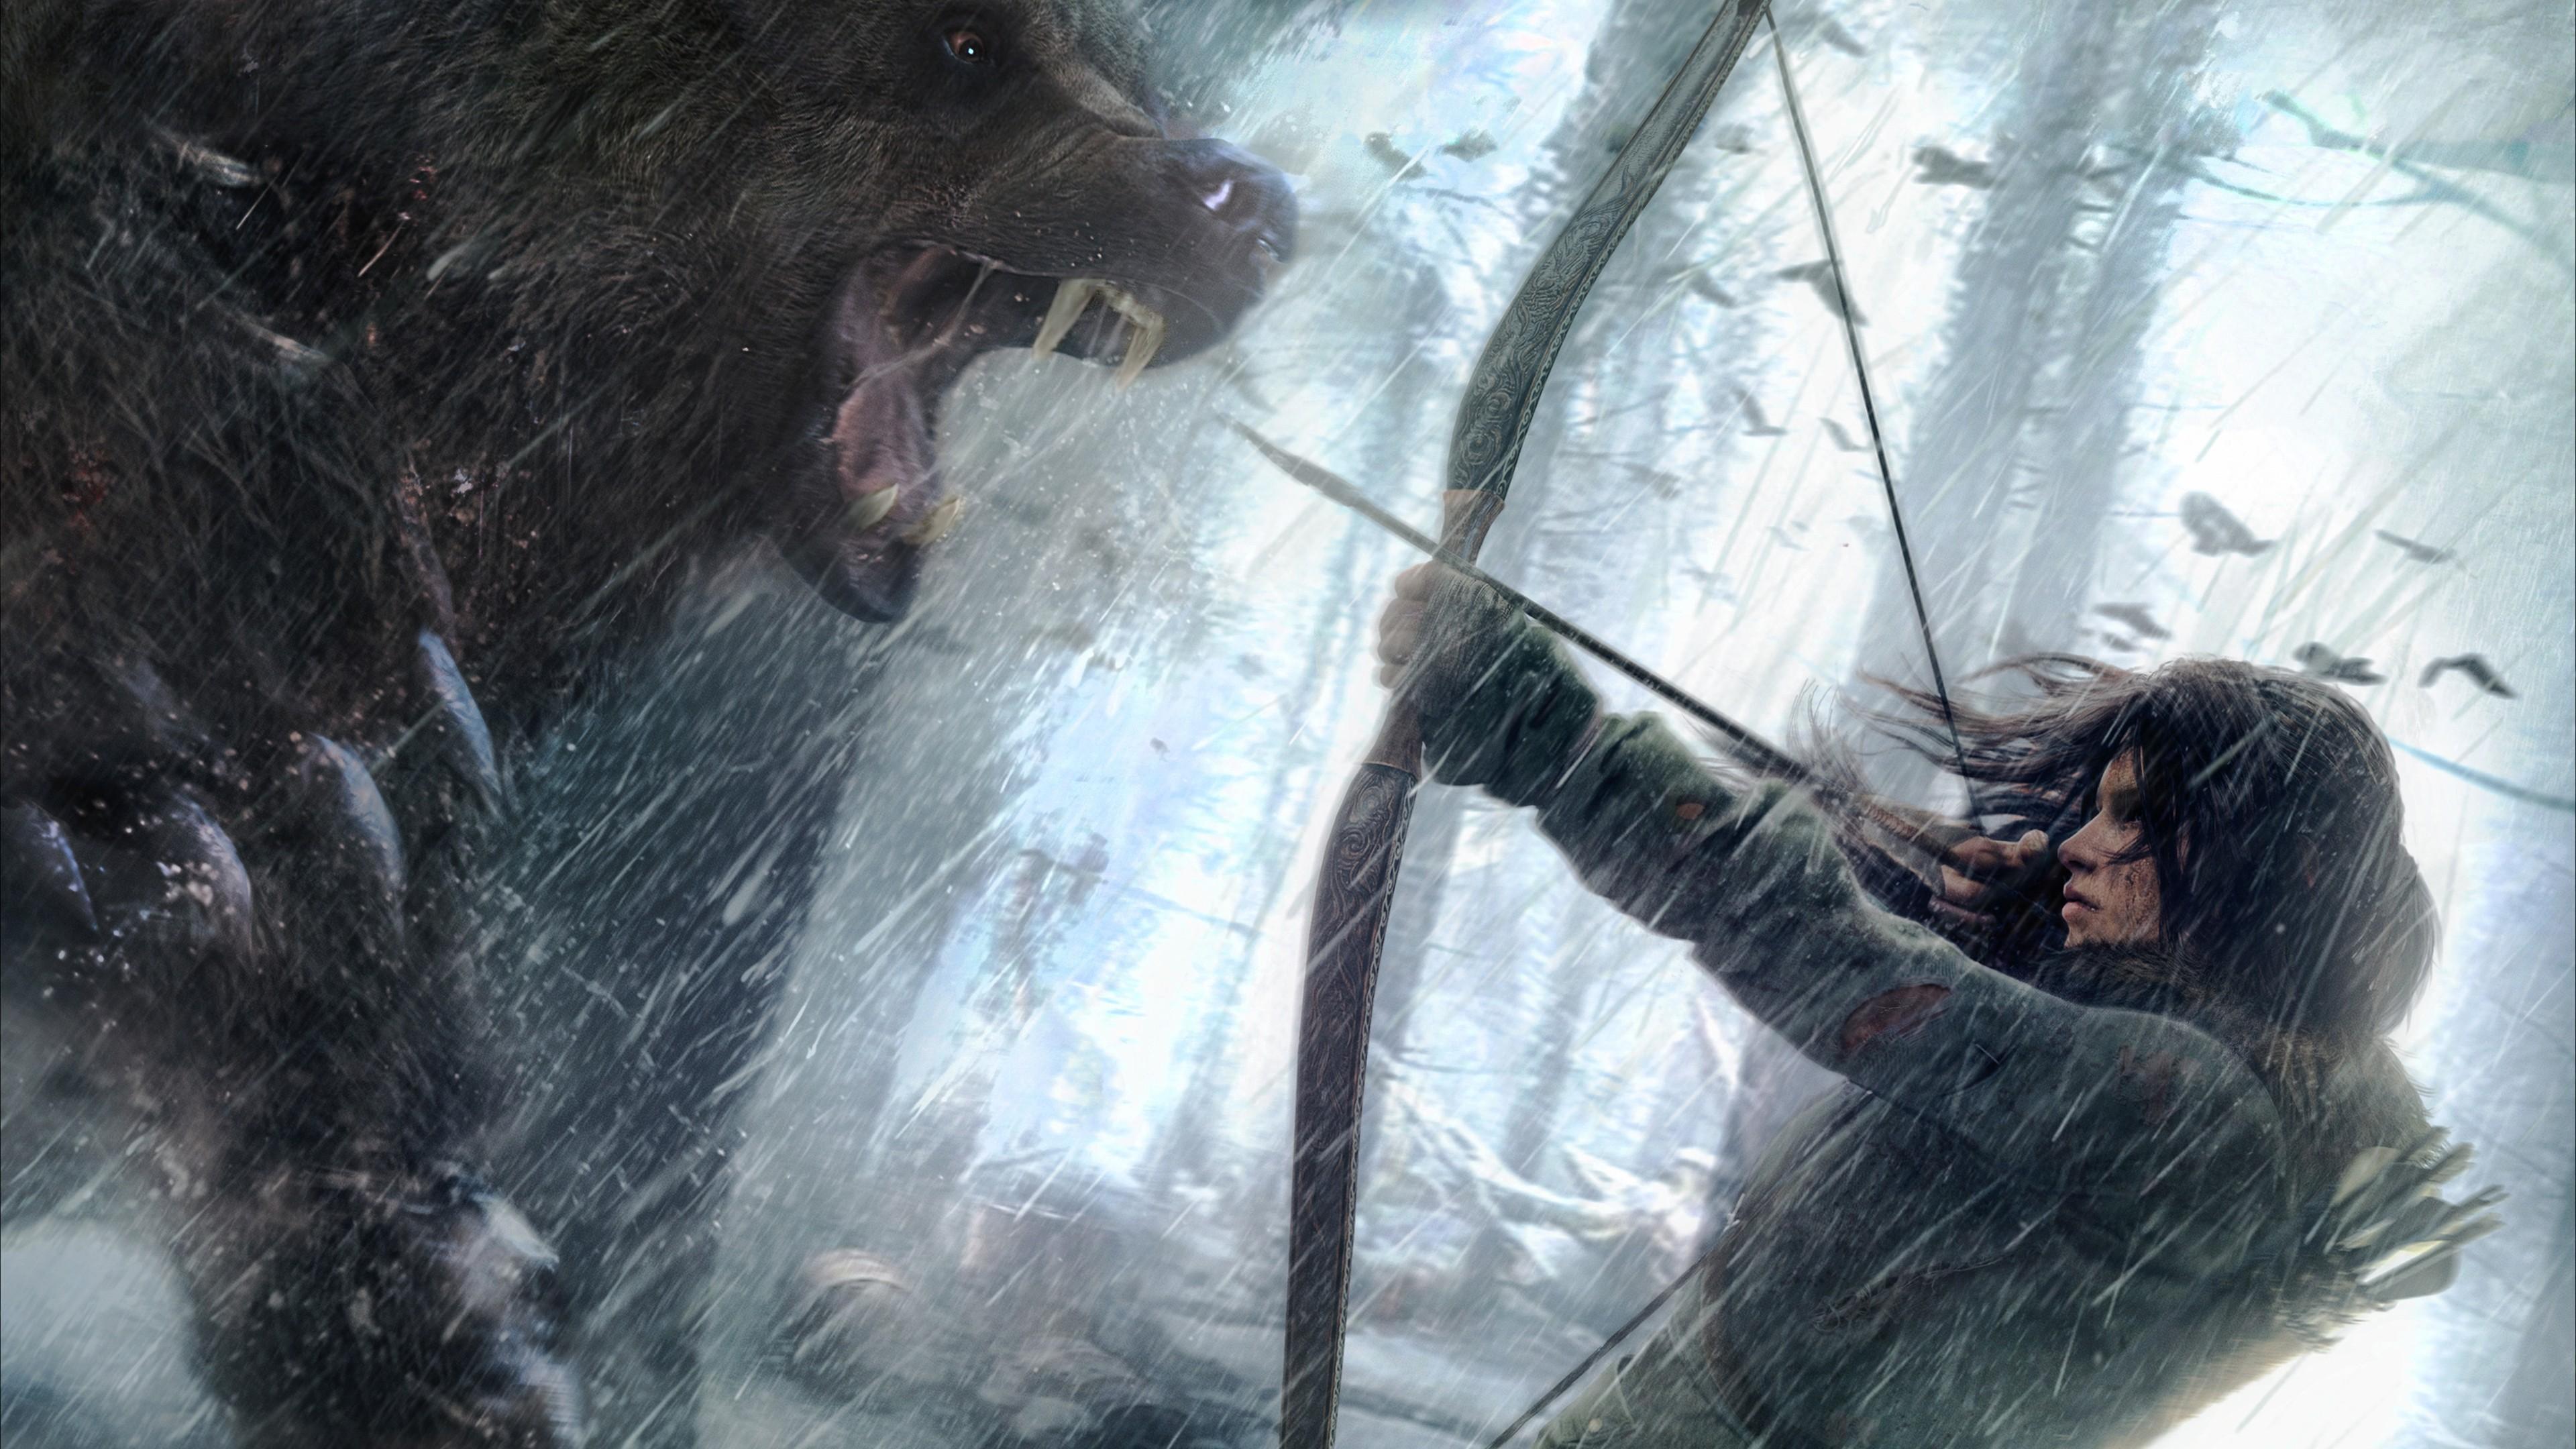 rise_of_the_tomb_raider-lara_croft-fighting-bear-art-3840x2160_1